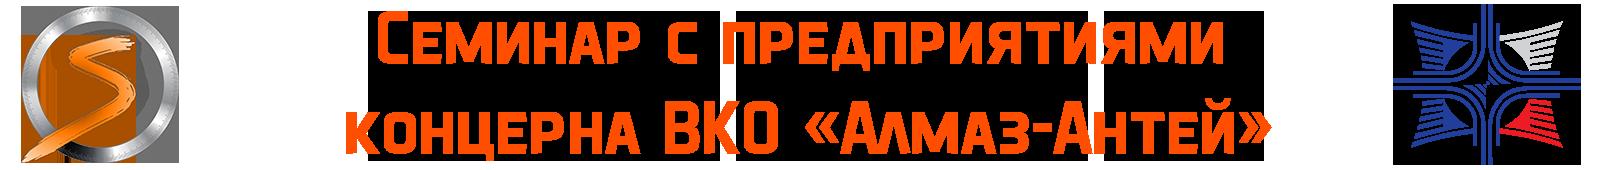 Центр СПРУТ Алмаз-Антей